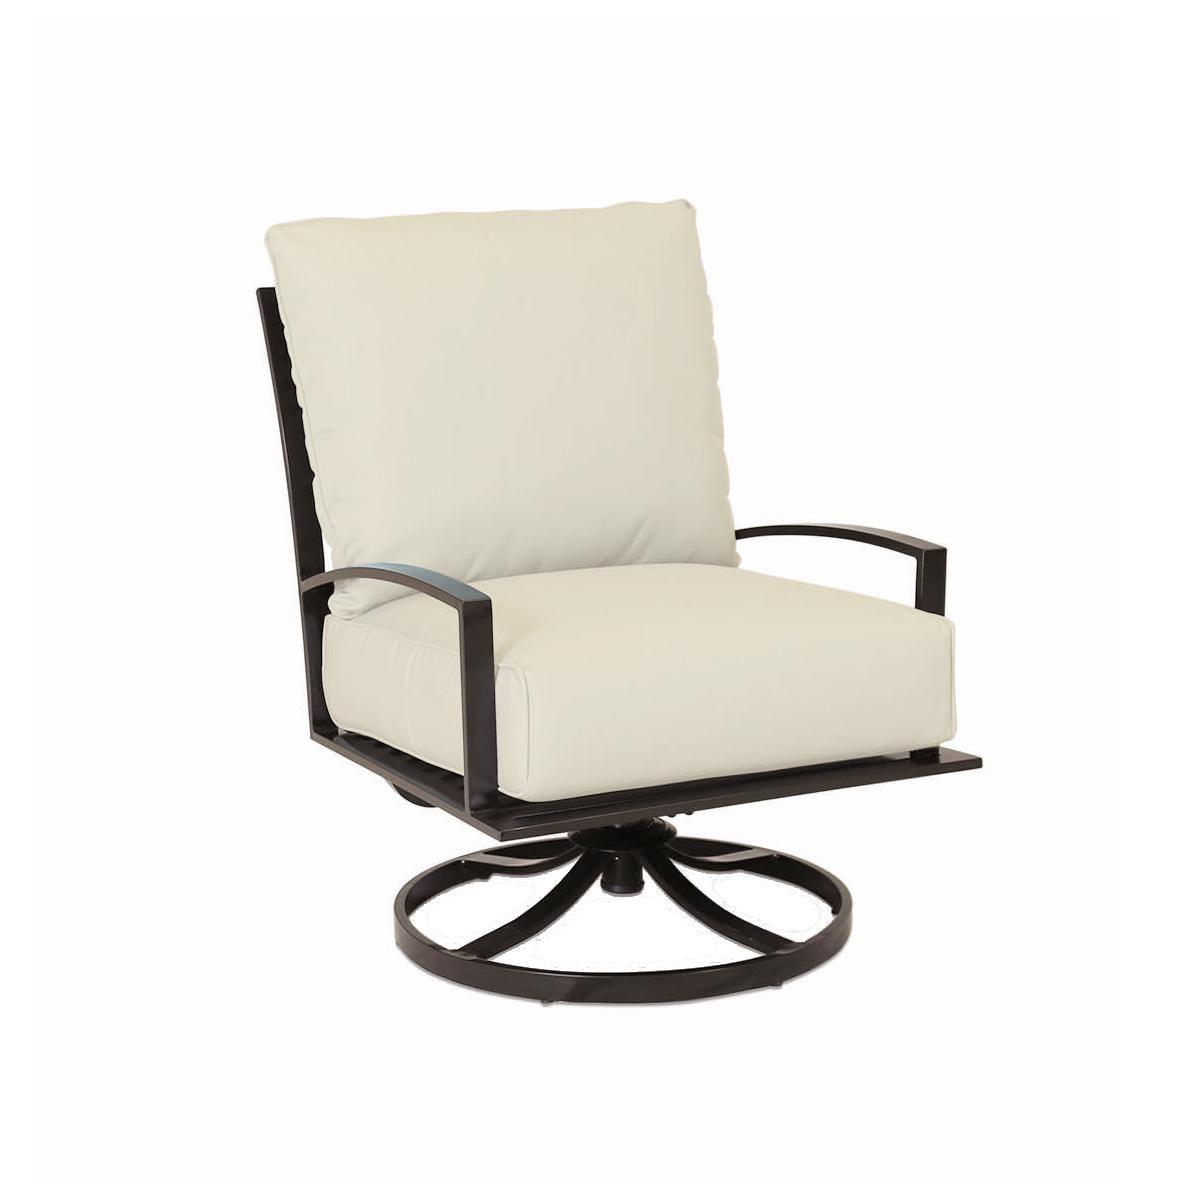 Sunset West La Jolla Aluminum Patio Swivel Rocker Club Chair